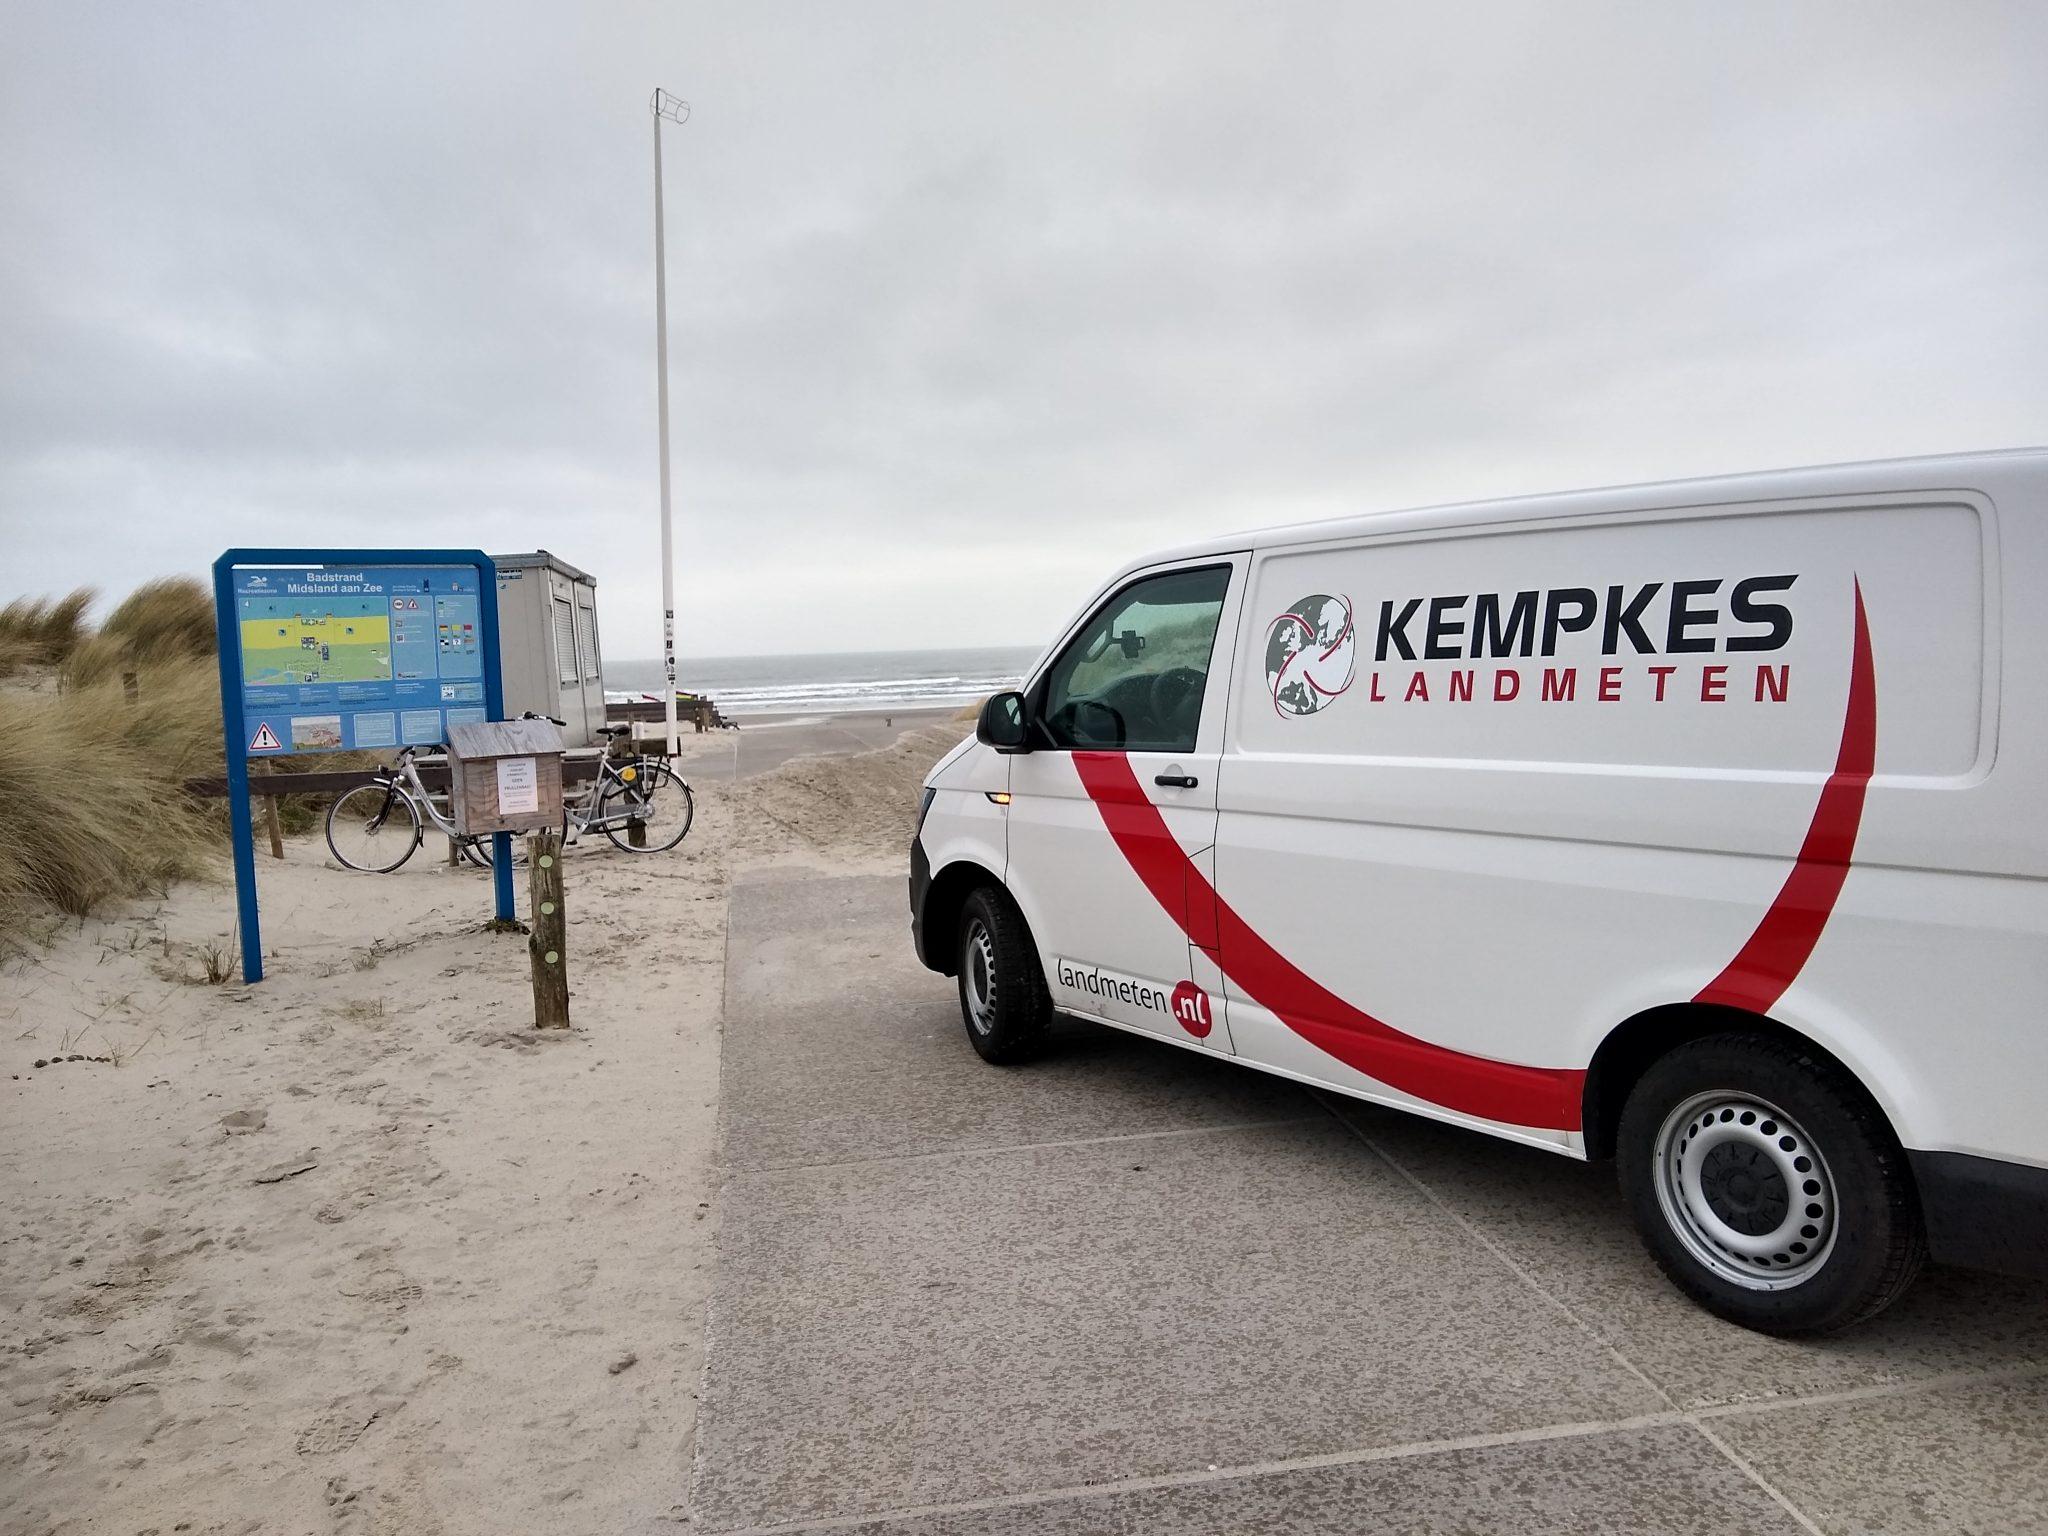 Noordzeestrand Kempkes landmetent